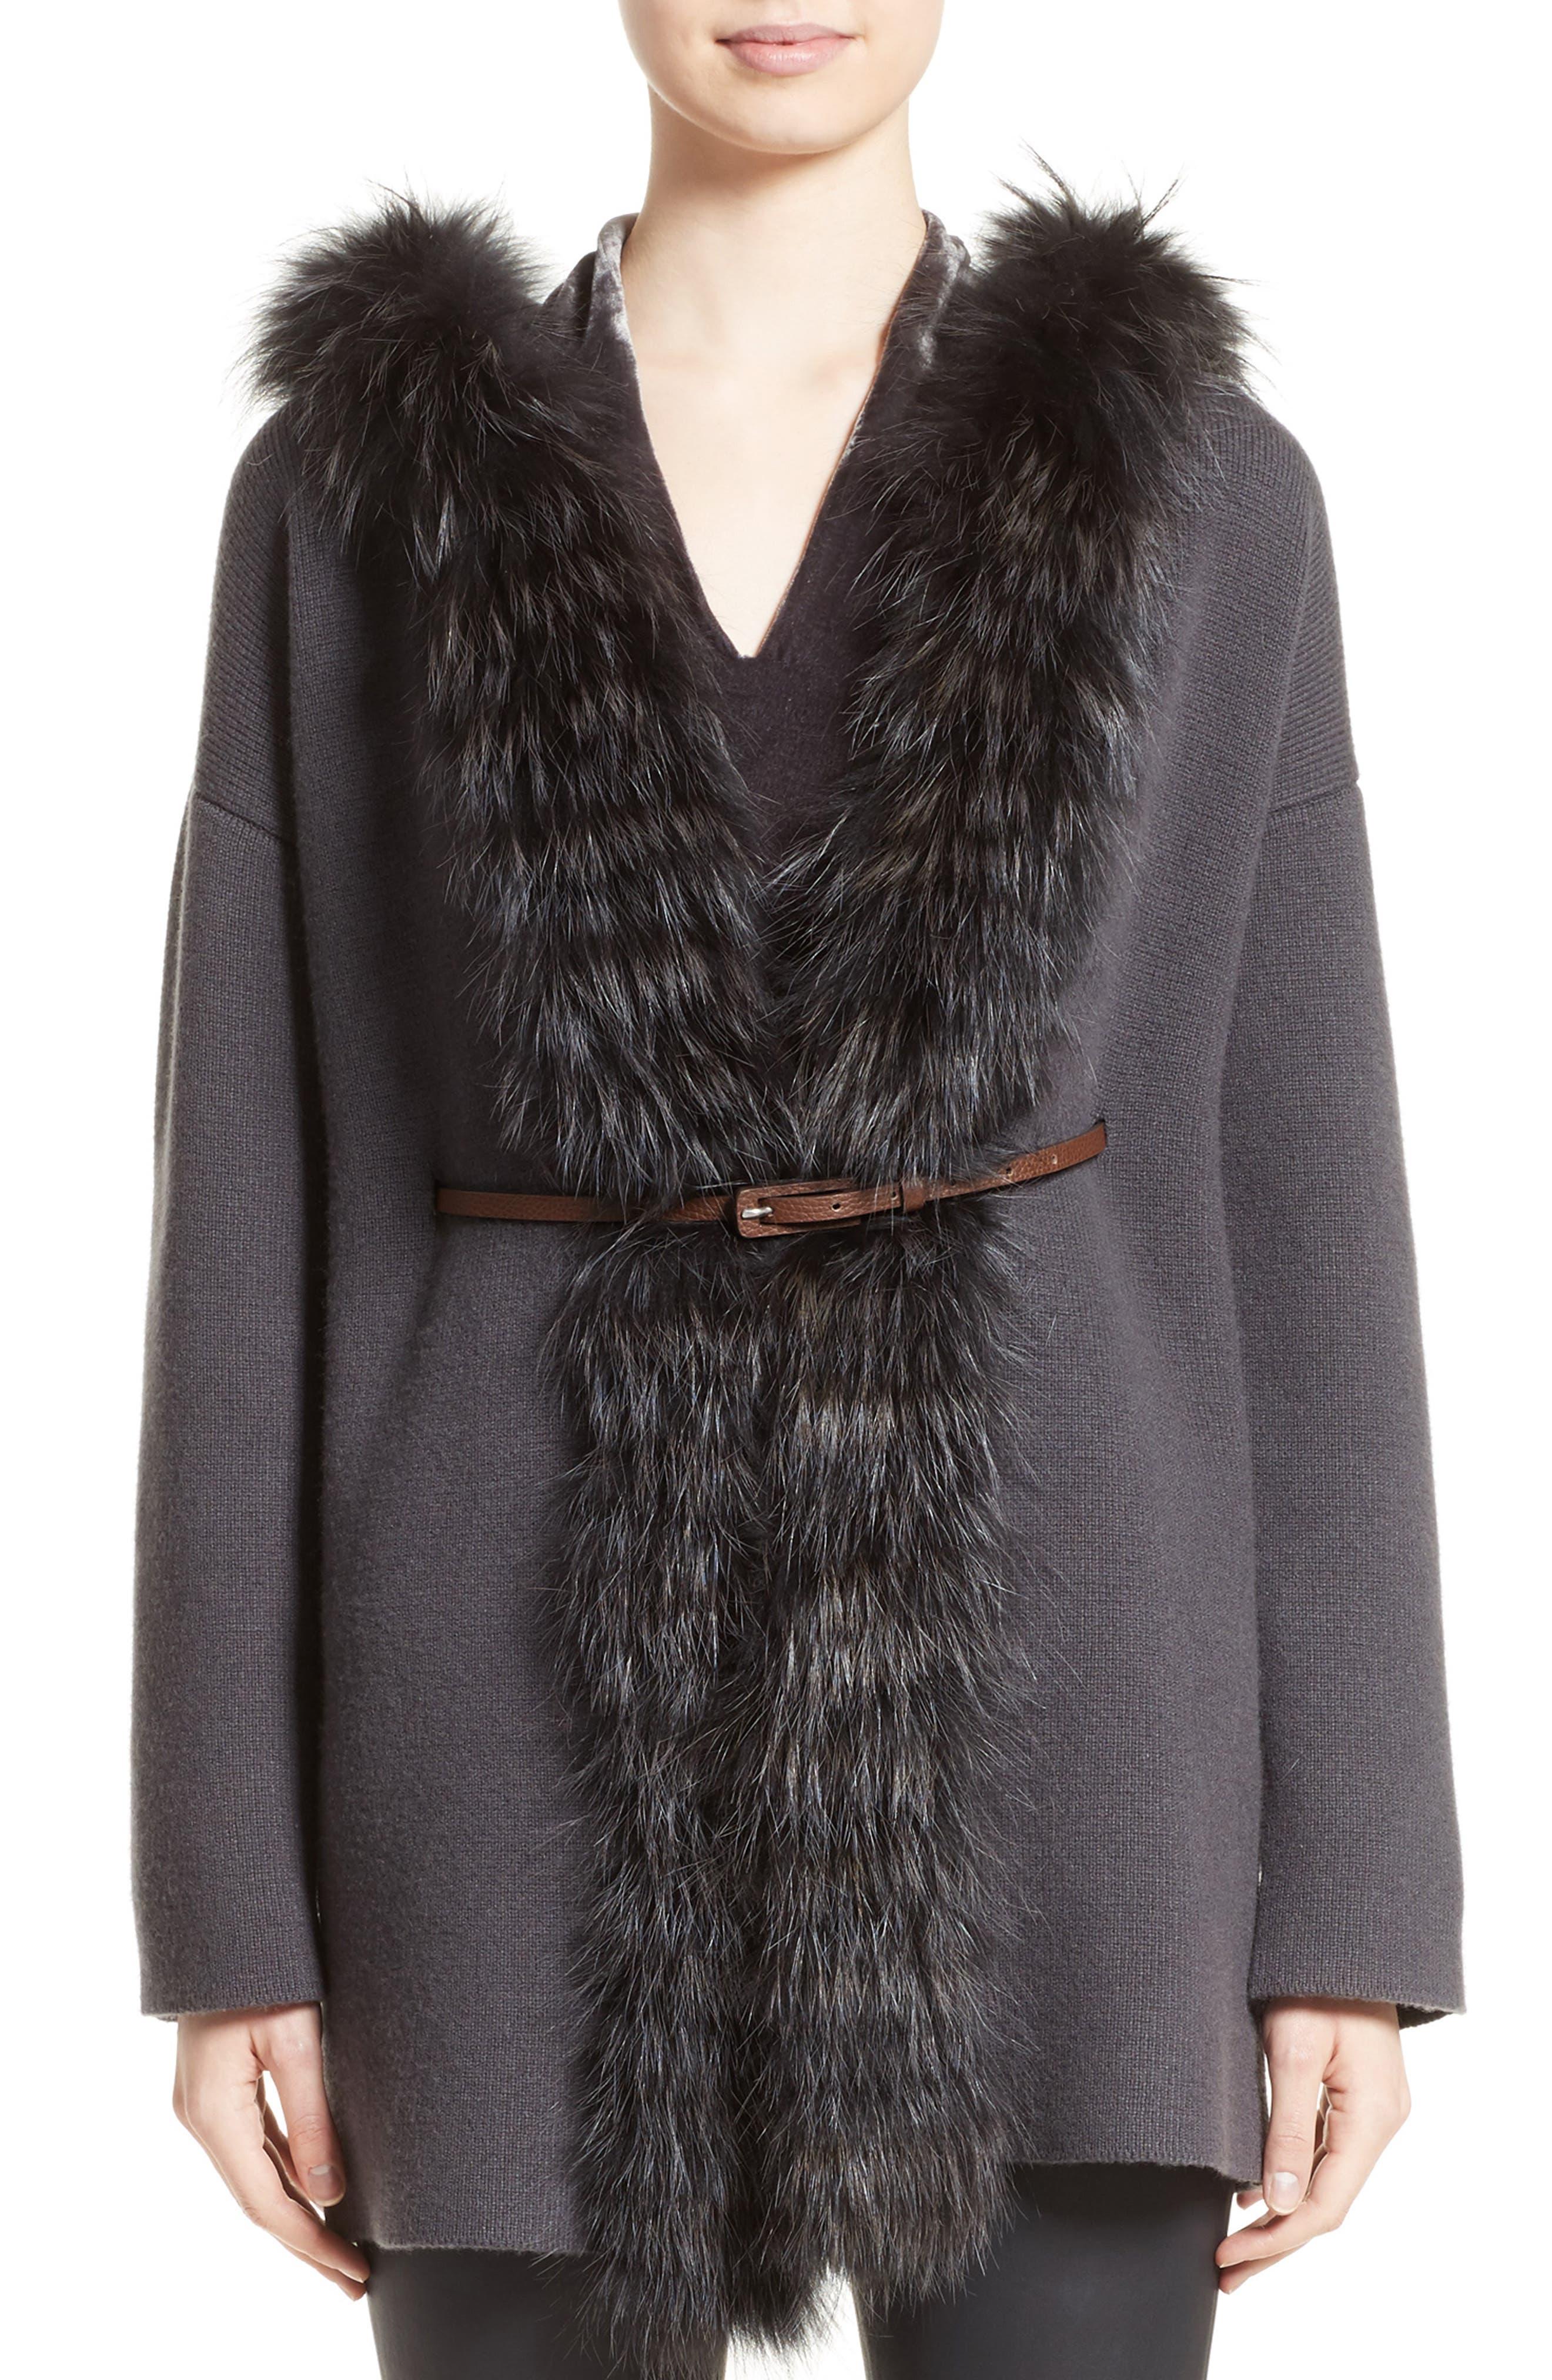 Fabiana Filippi Belted Cashmere Hoodie with Genuine Fox Fur Trim